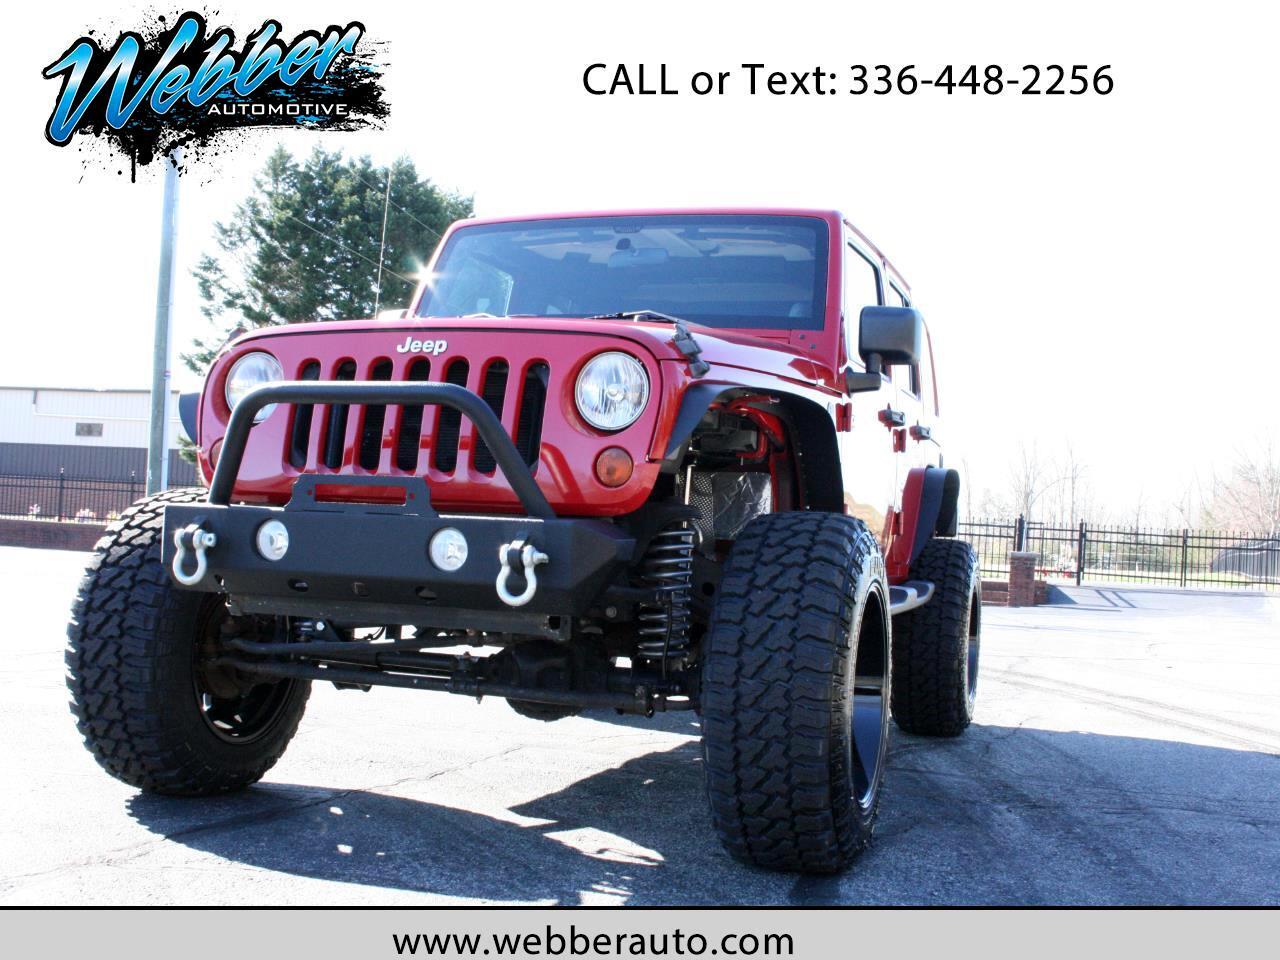 2011 Jeep Wrangler Unlimited Sahara 4WD